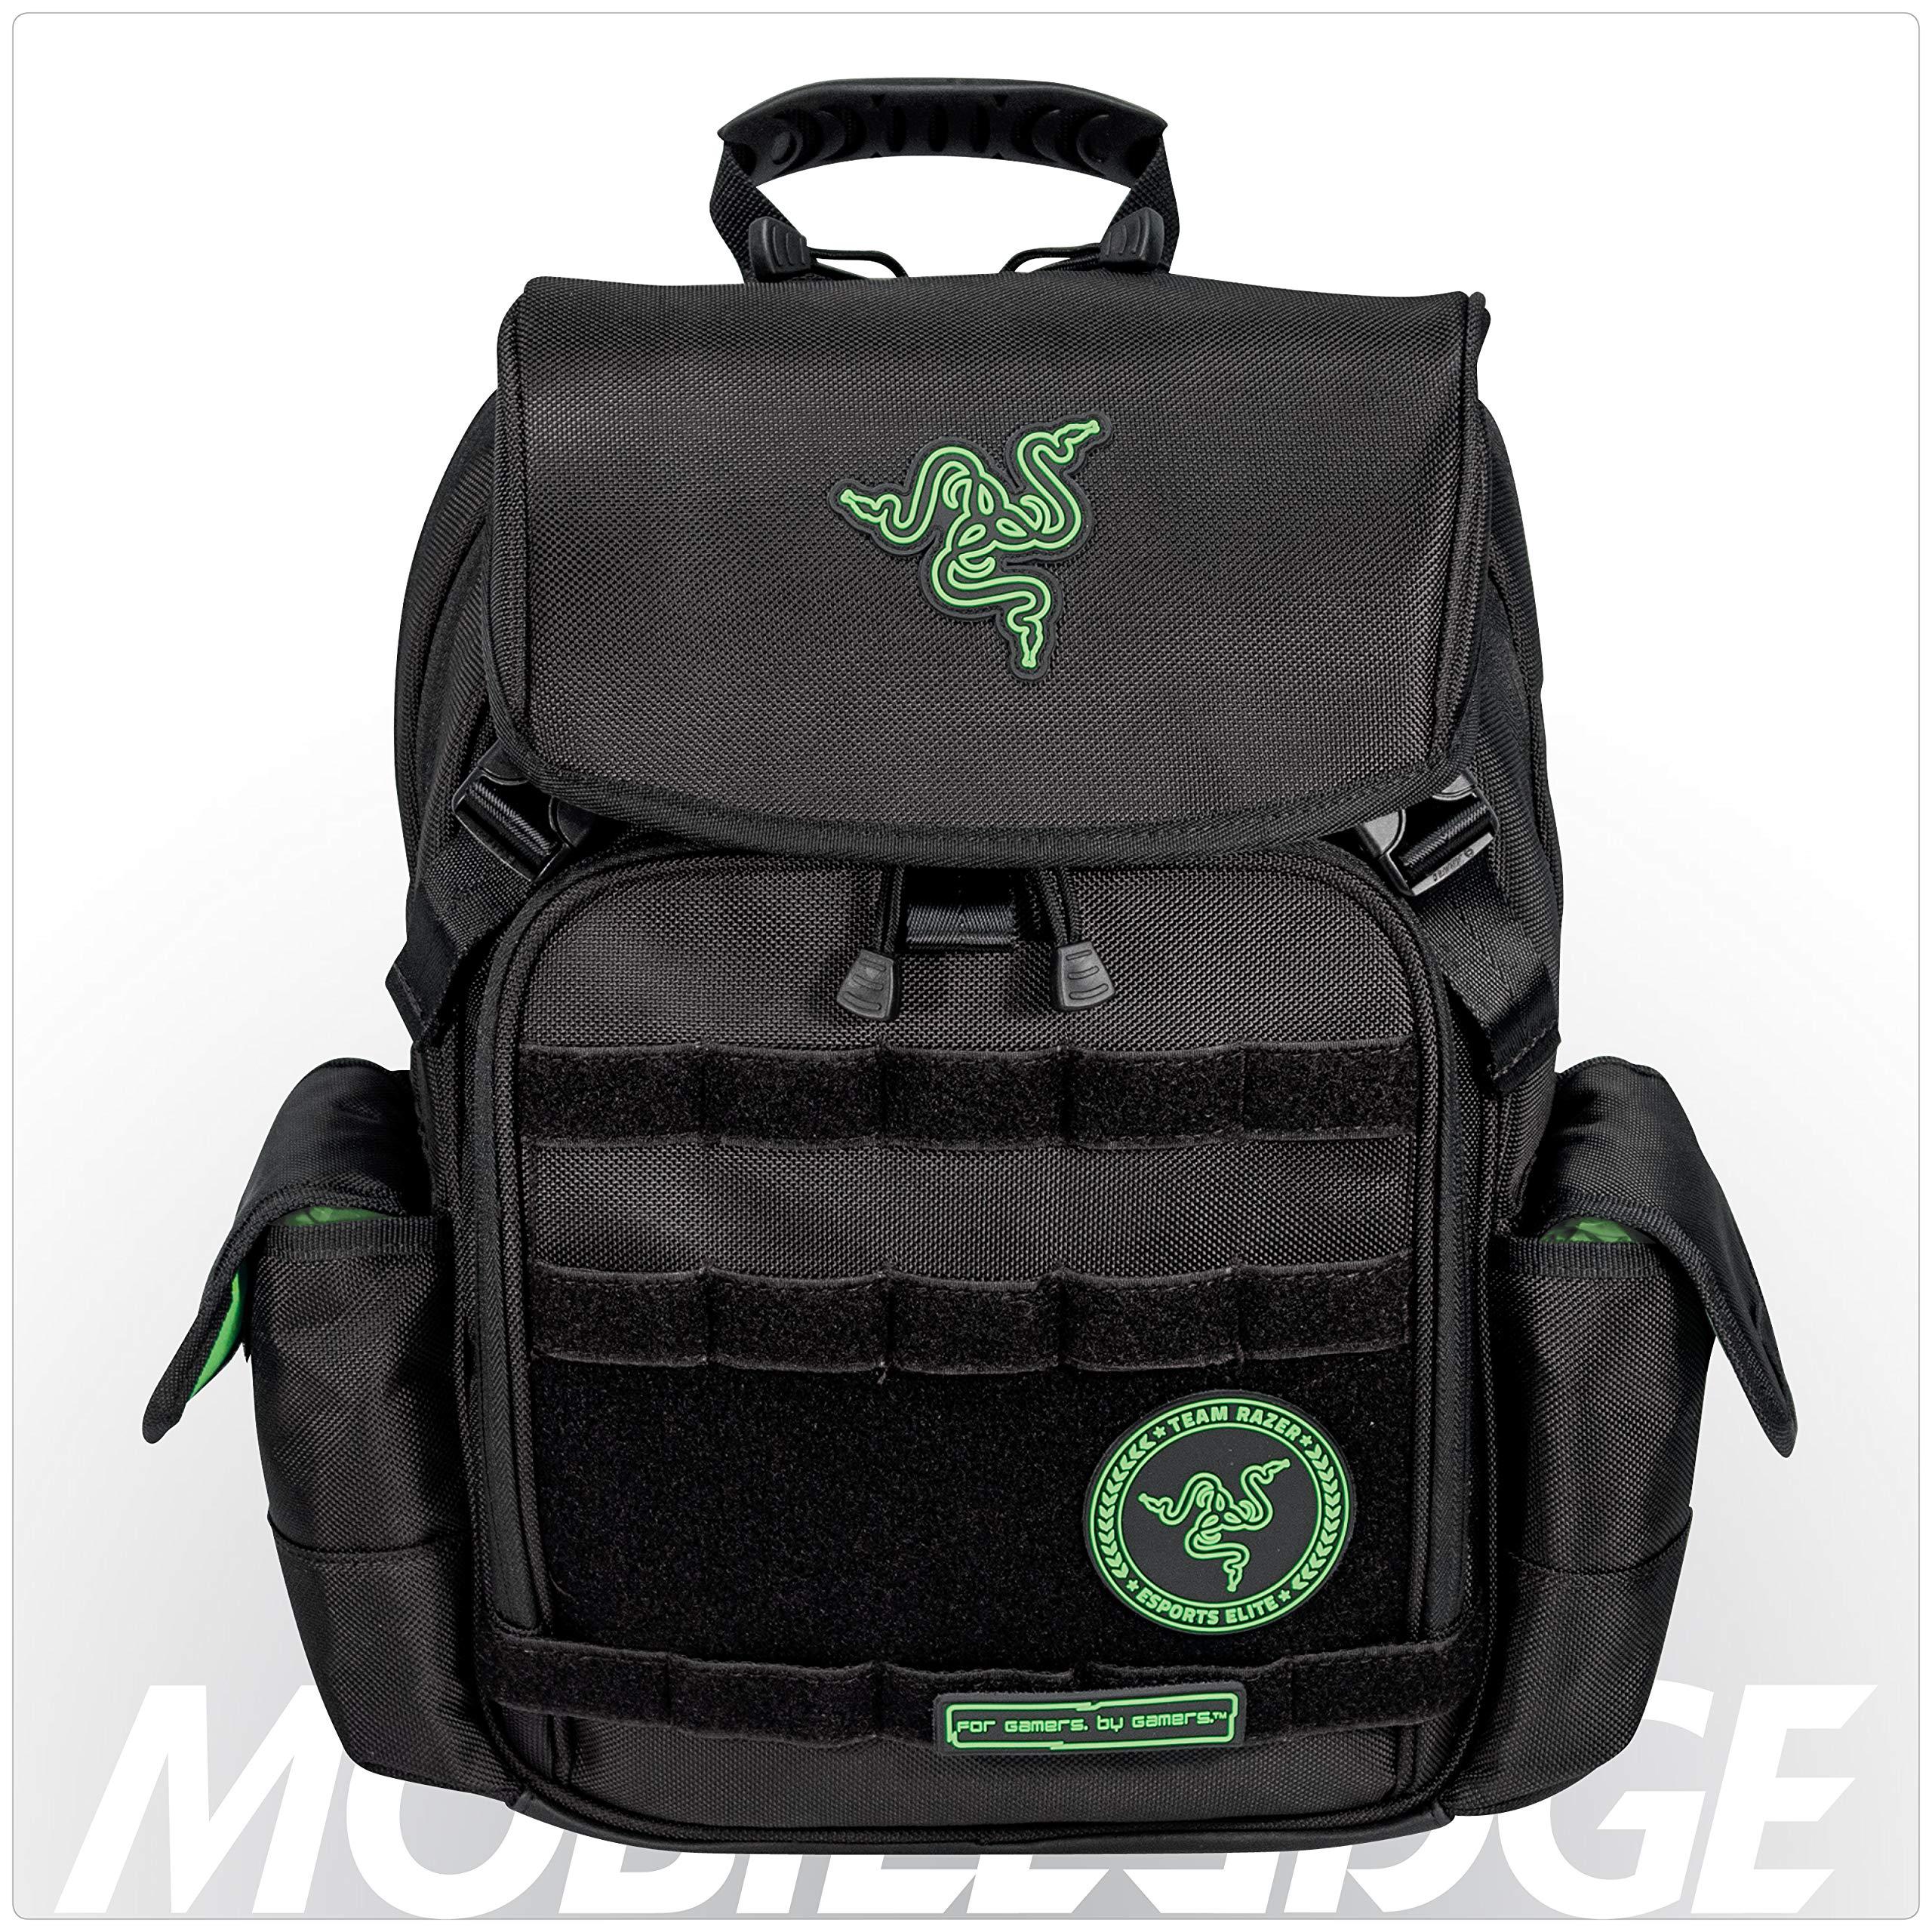 Mobile Edge Razer Tactical 15 Inch Laptop Gaming Backpack, Black, Rugged Ballistic Material, Padded Laptop Section, Tablet Pocket, Water-Resistant, RAZERBP15